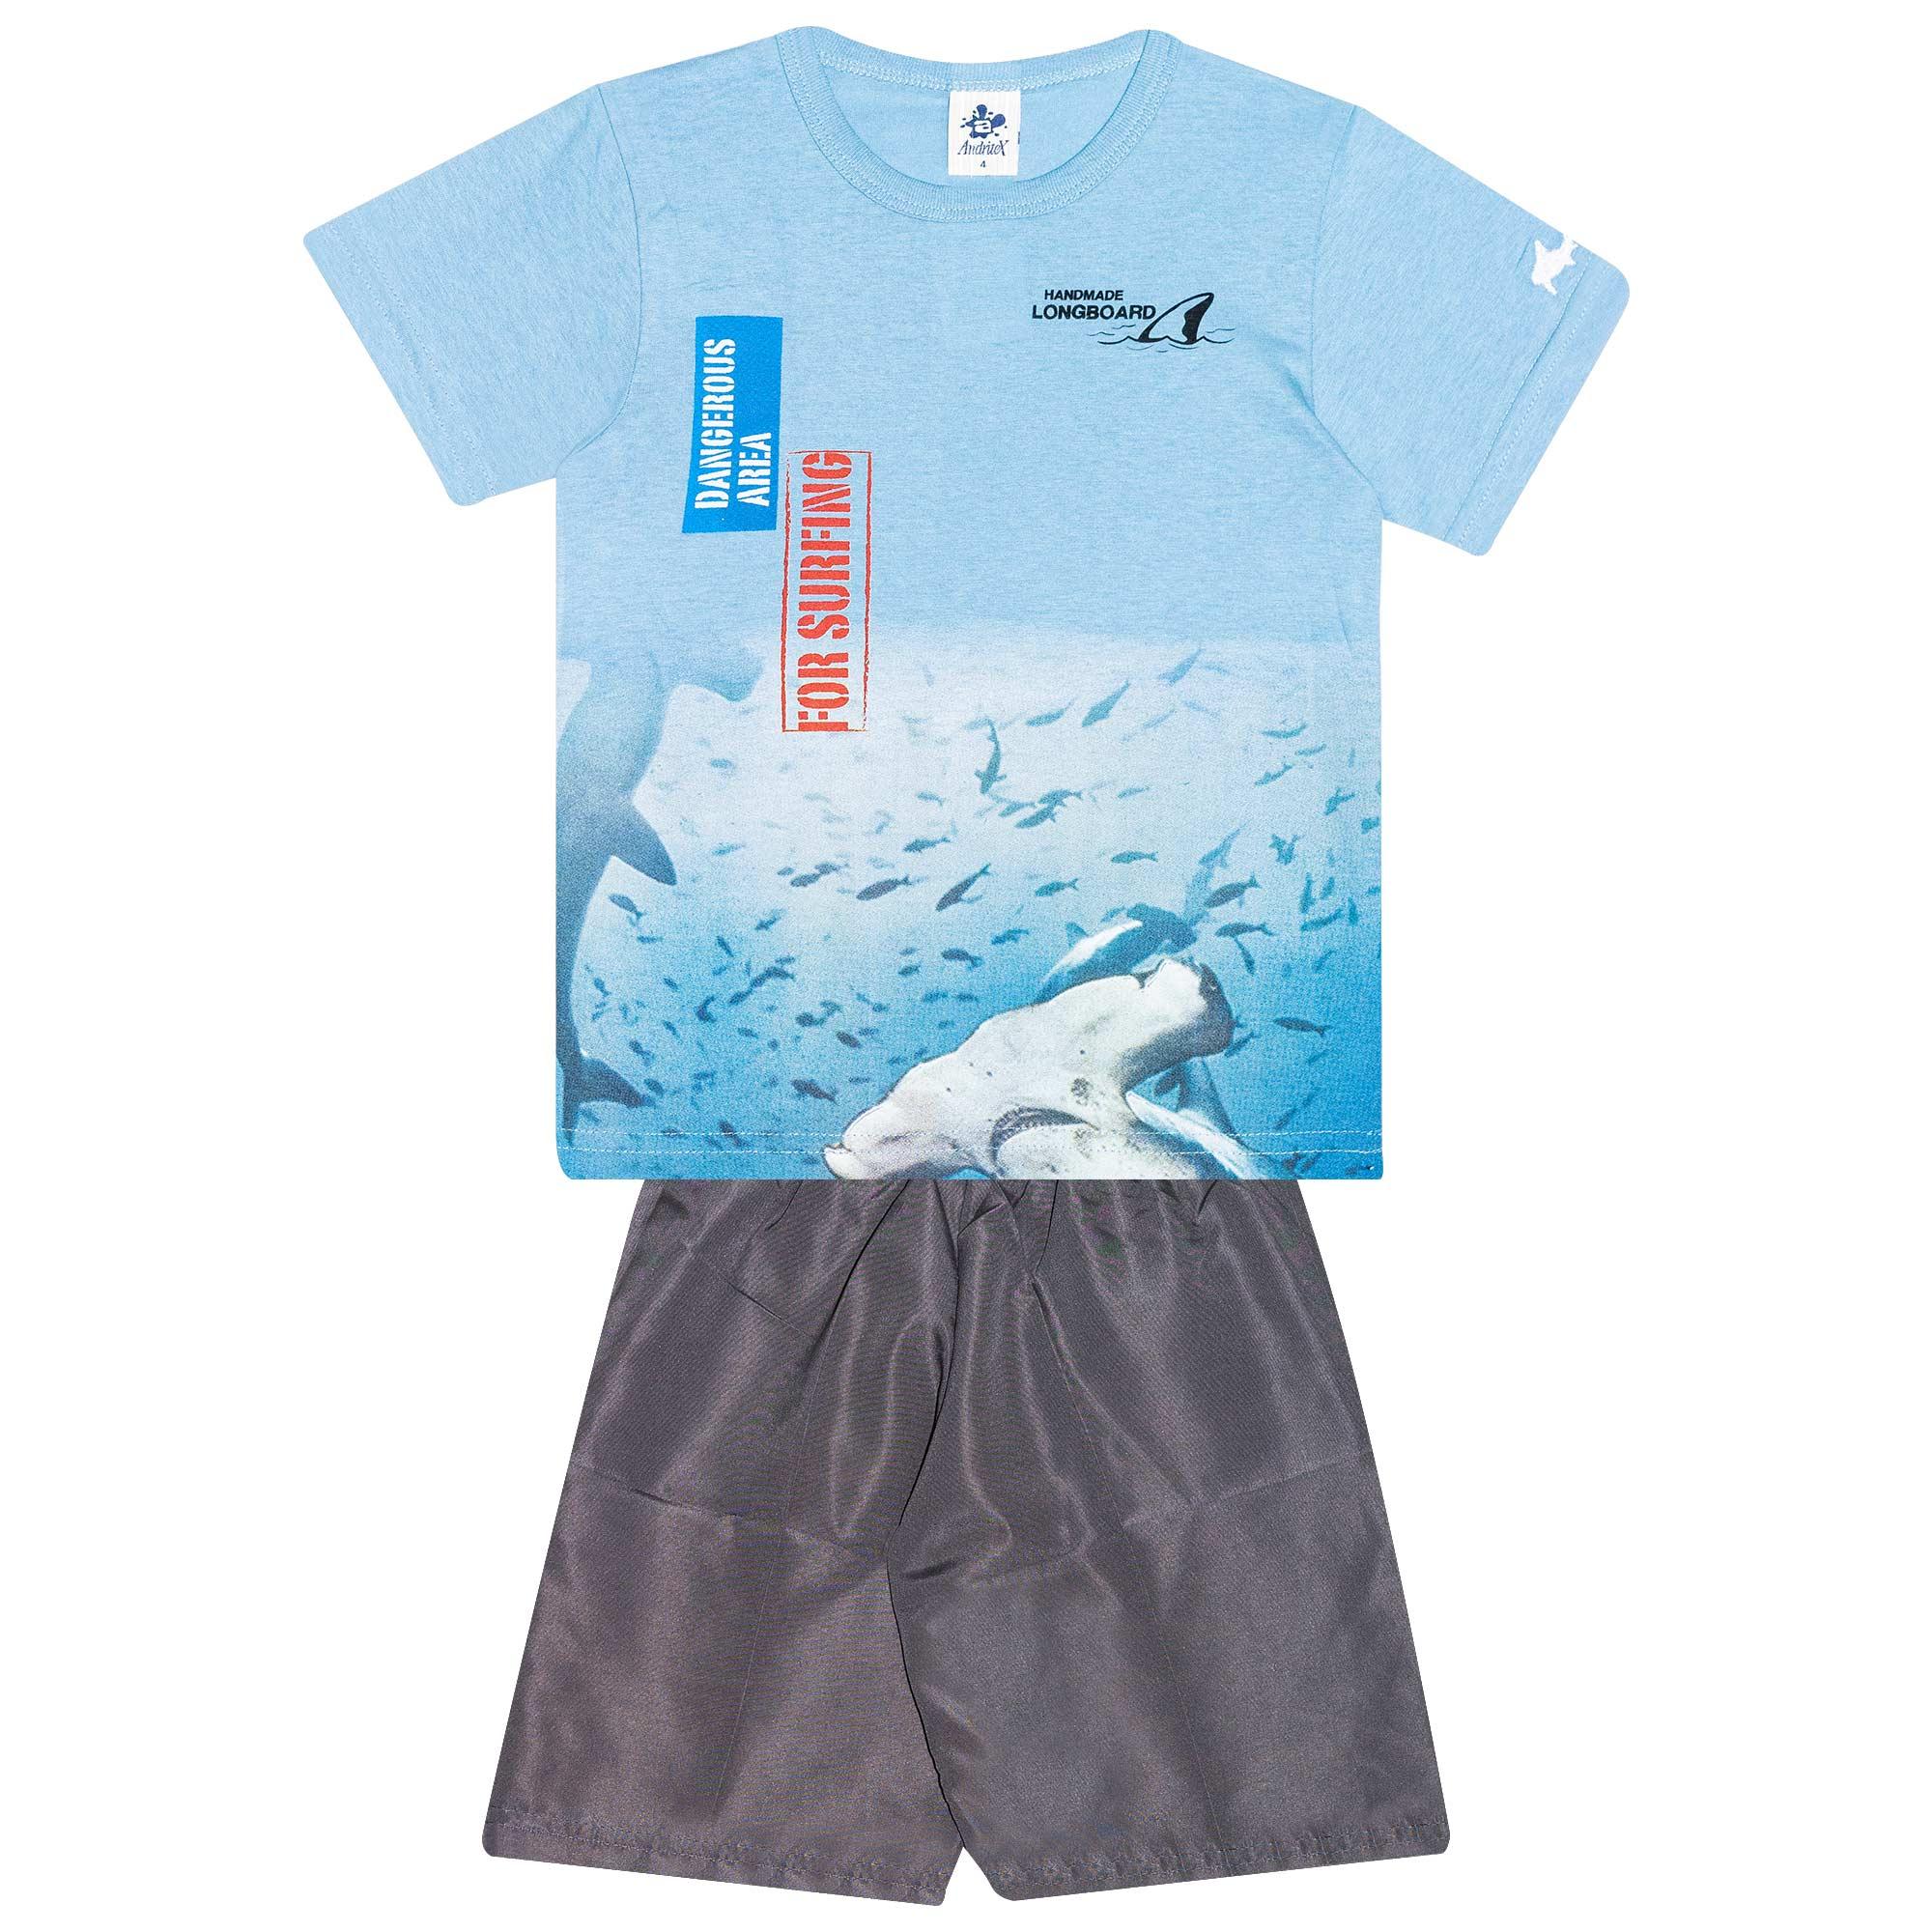 Conjunto Infantil Masculino - Ref 4770  - Azul - Andritex